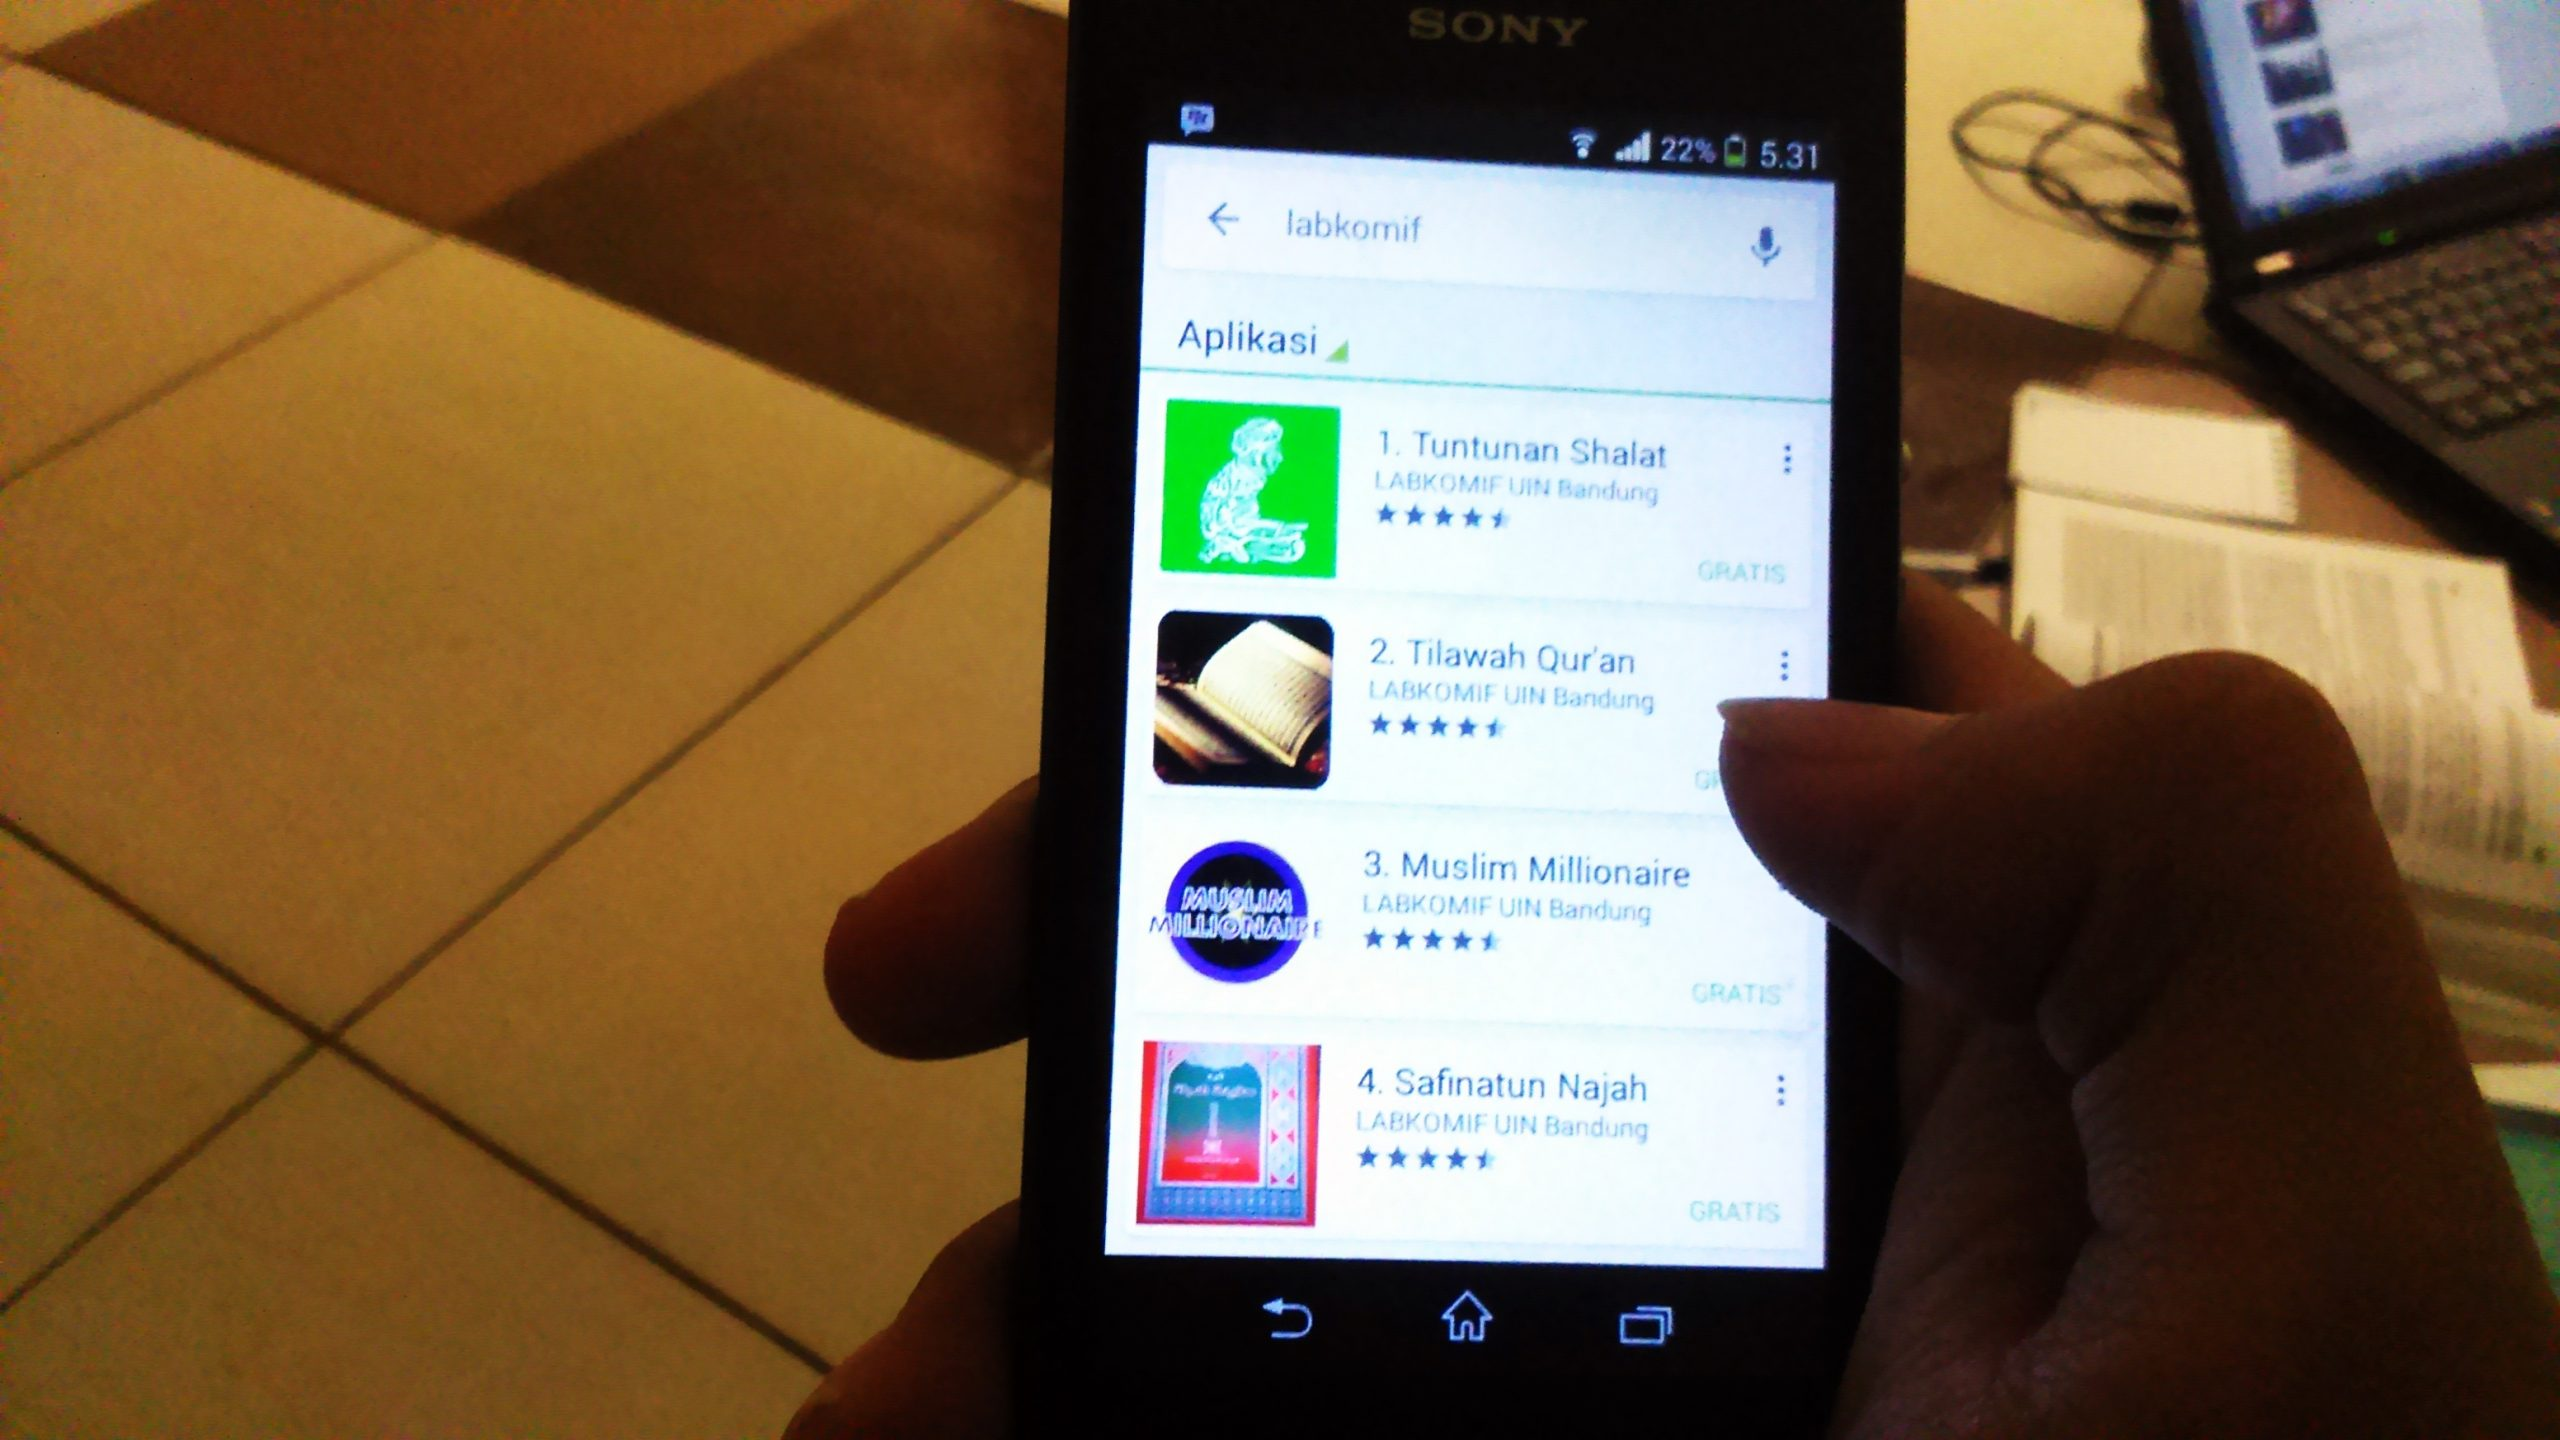 Berbagai Aplikasi android yang di unggah oleh Labkomif UIN SGD Bandung pada Playstore.